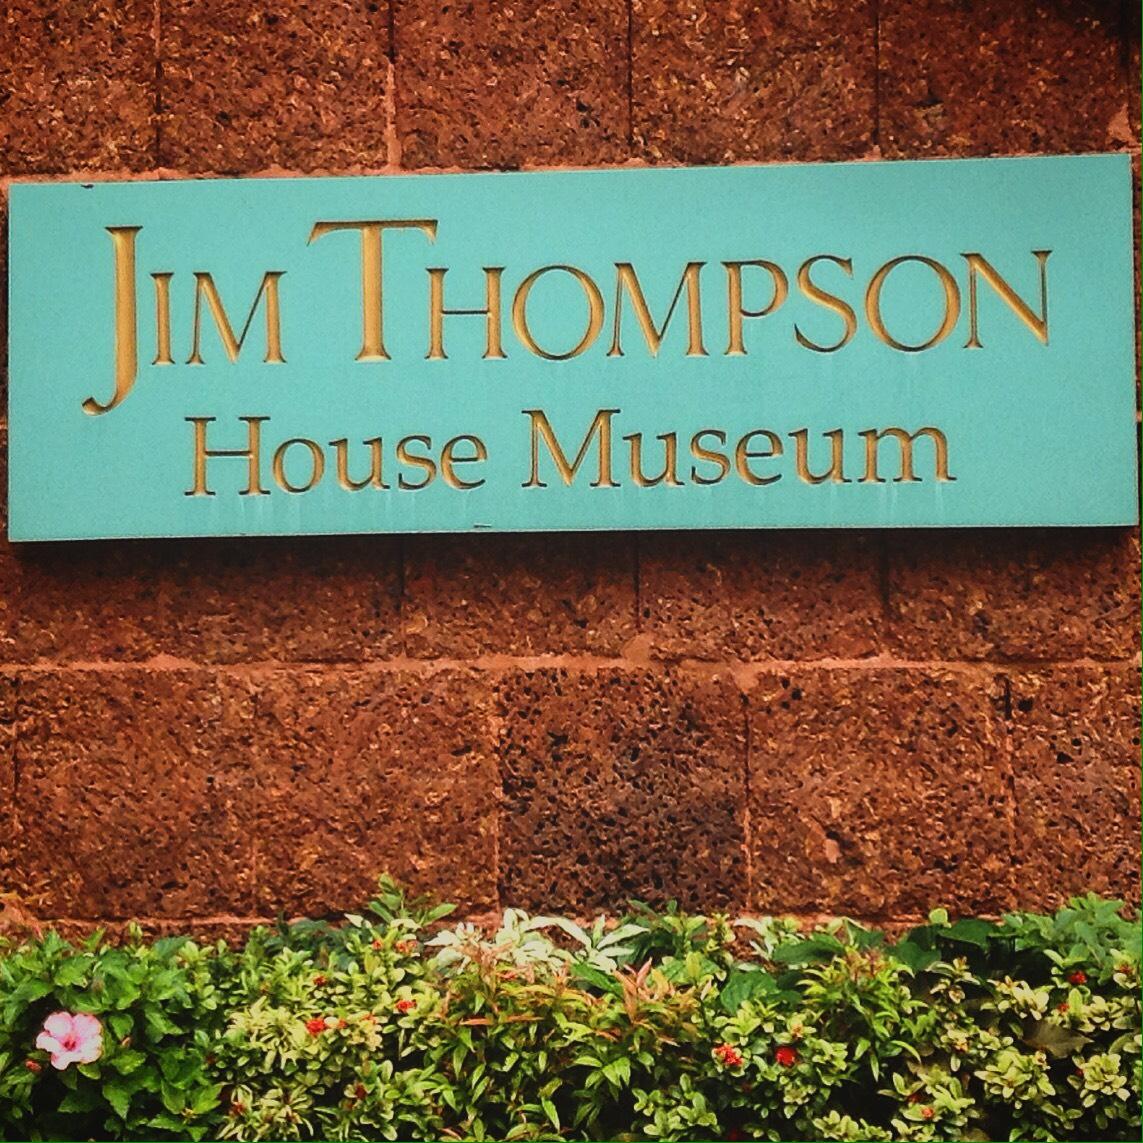 Jim Thompson House Museum, Bangkok, Thailand